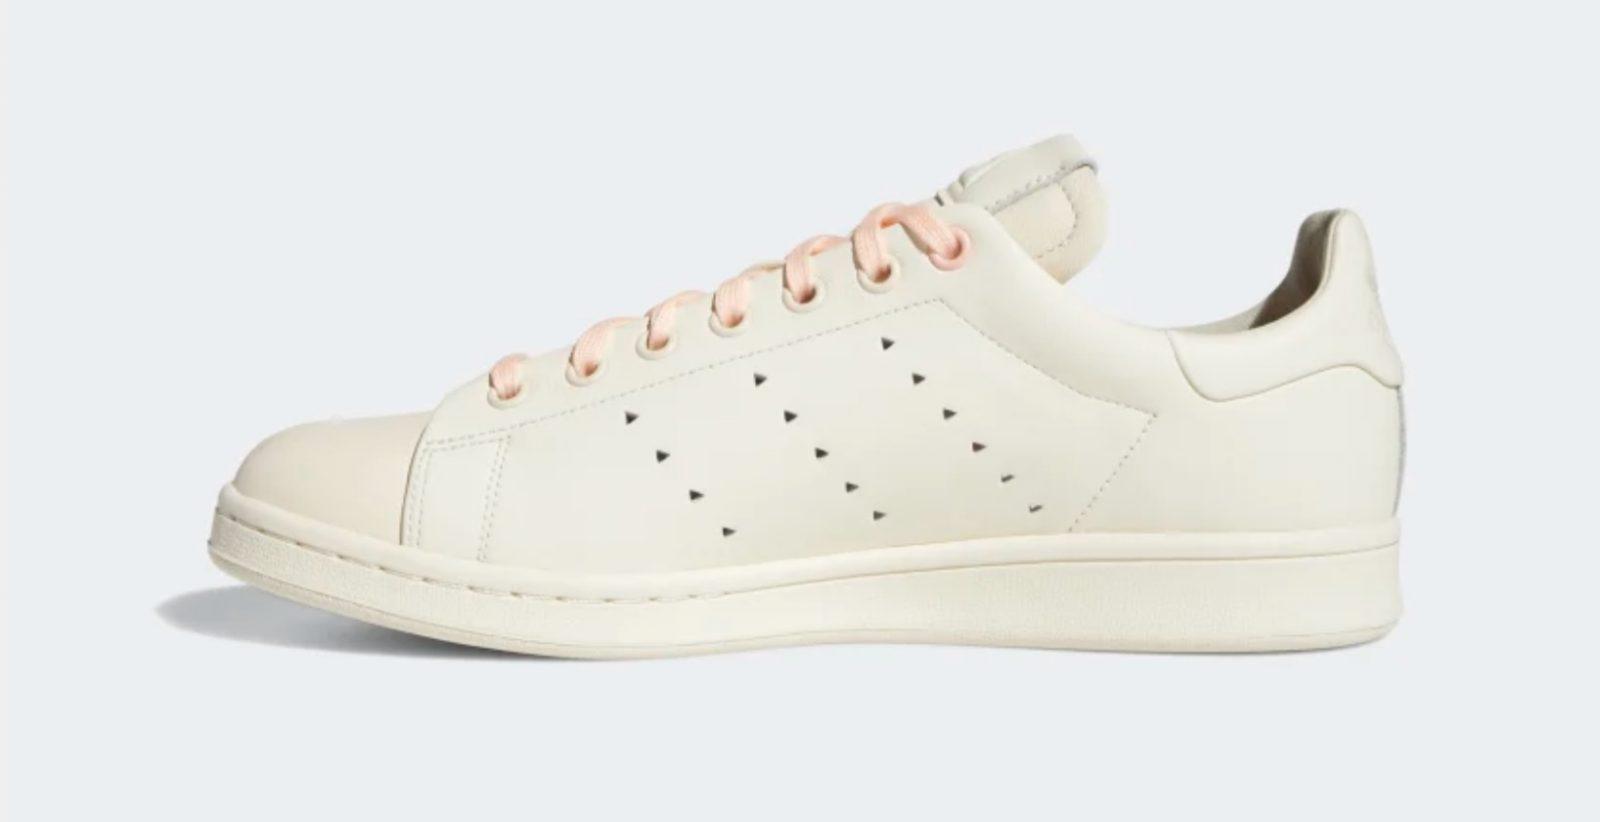 Pharrell Williams x adidas Stan Smith cream